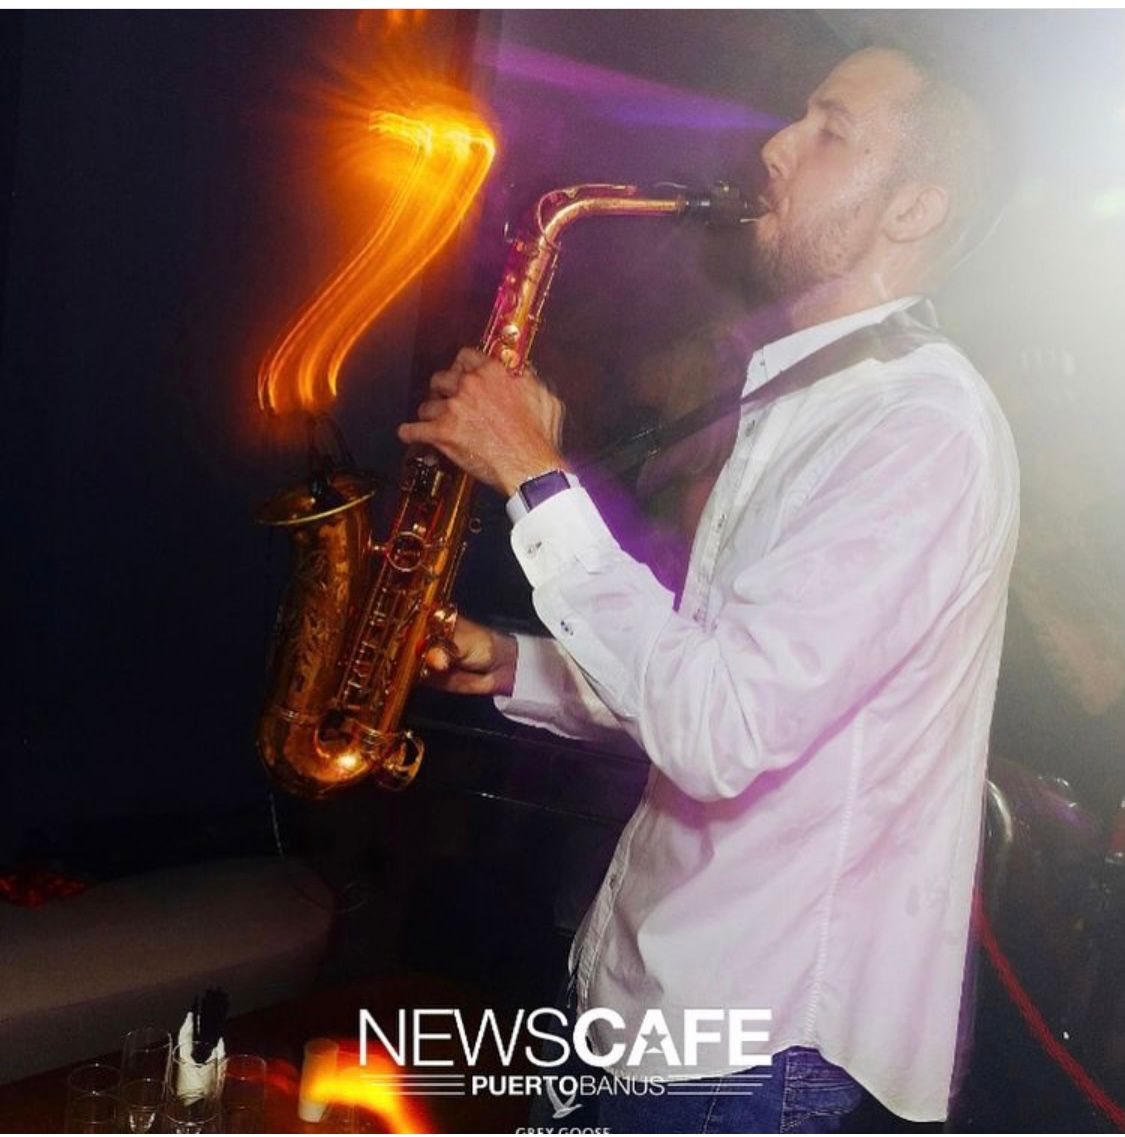 Adrian Jimenez Diaz,Wedding Saxophonist based in Malaga, Spain